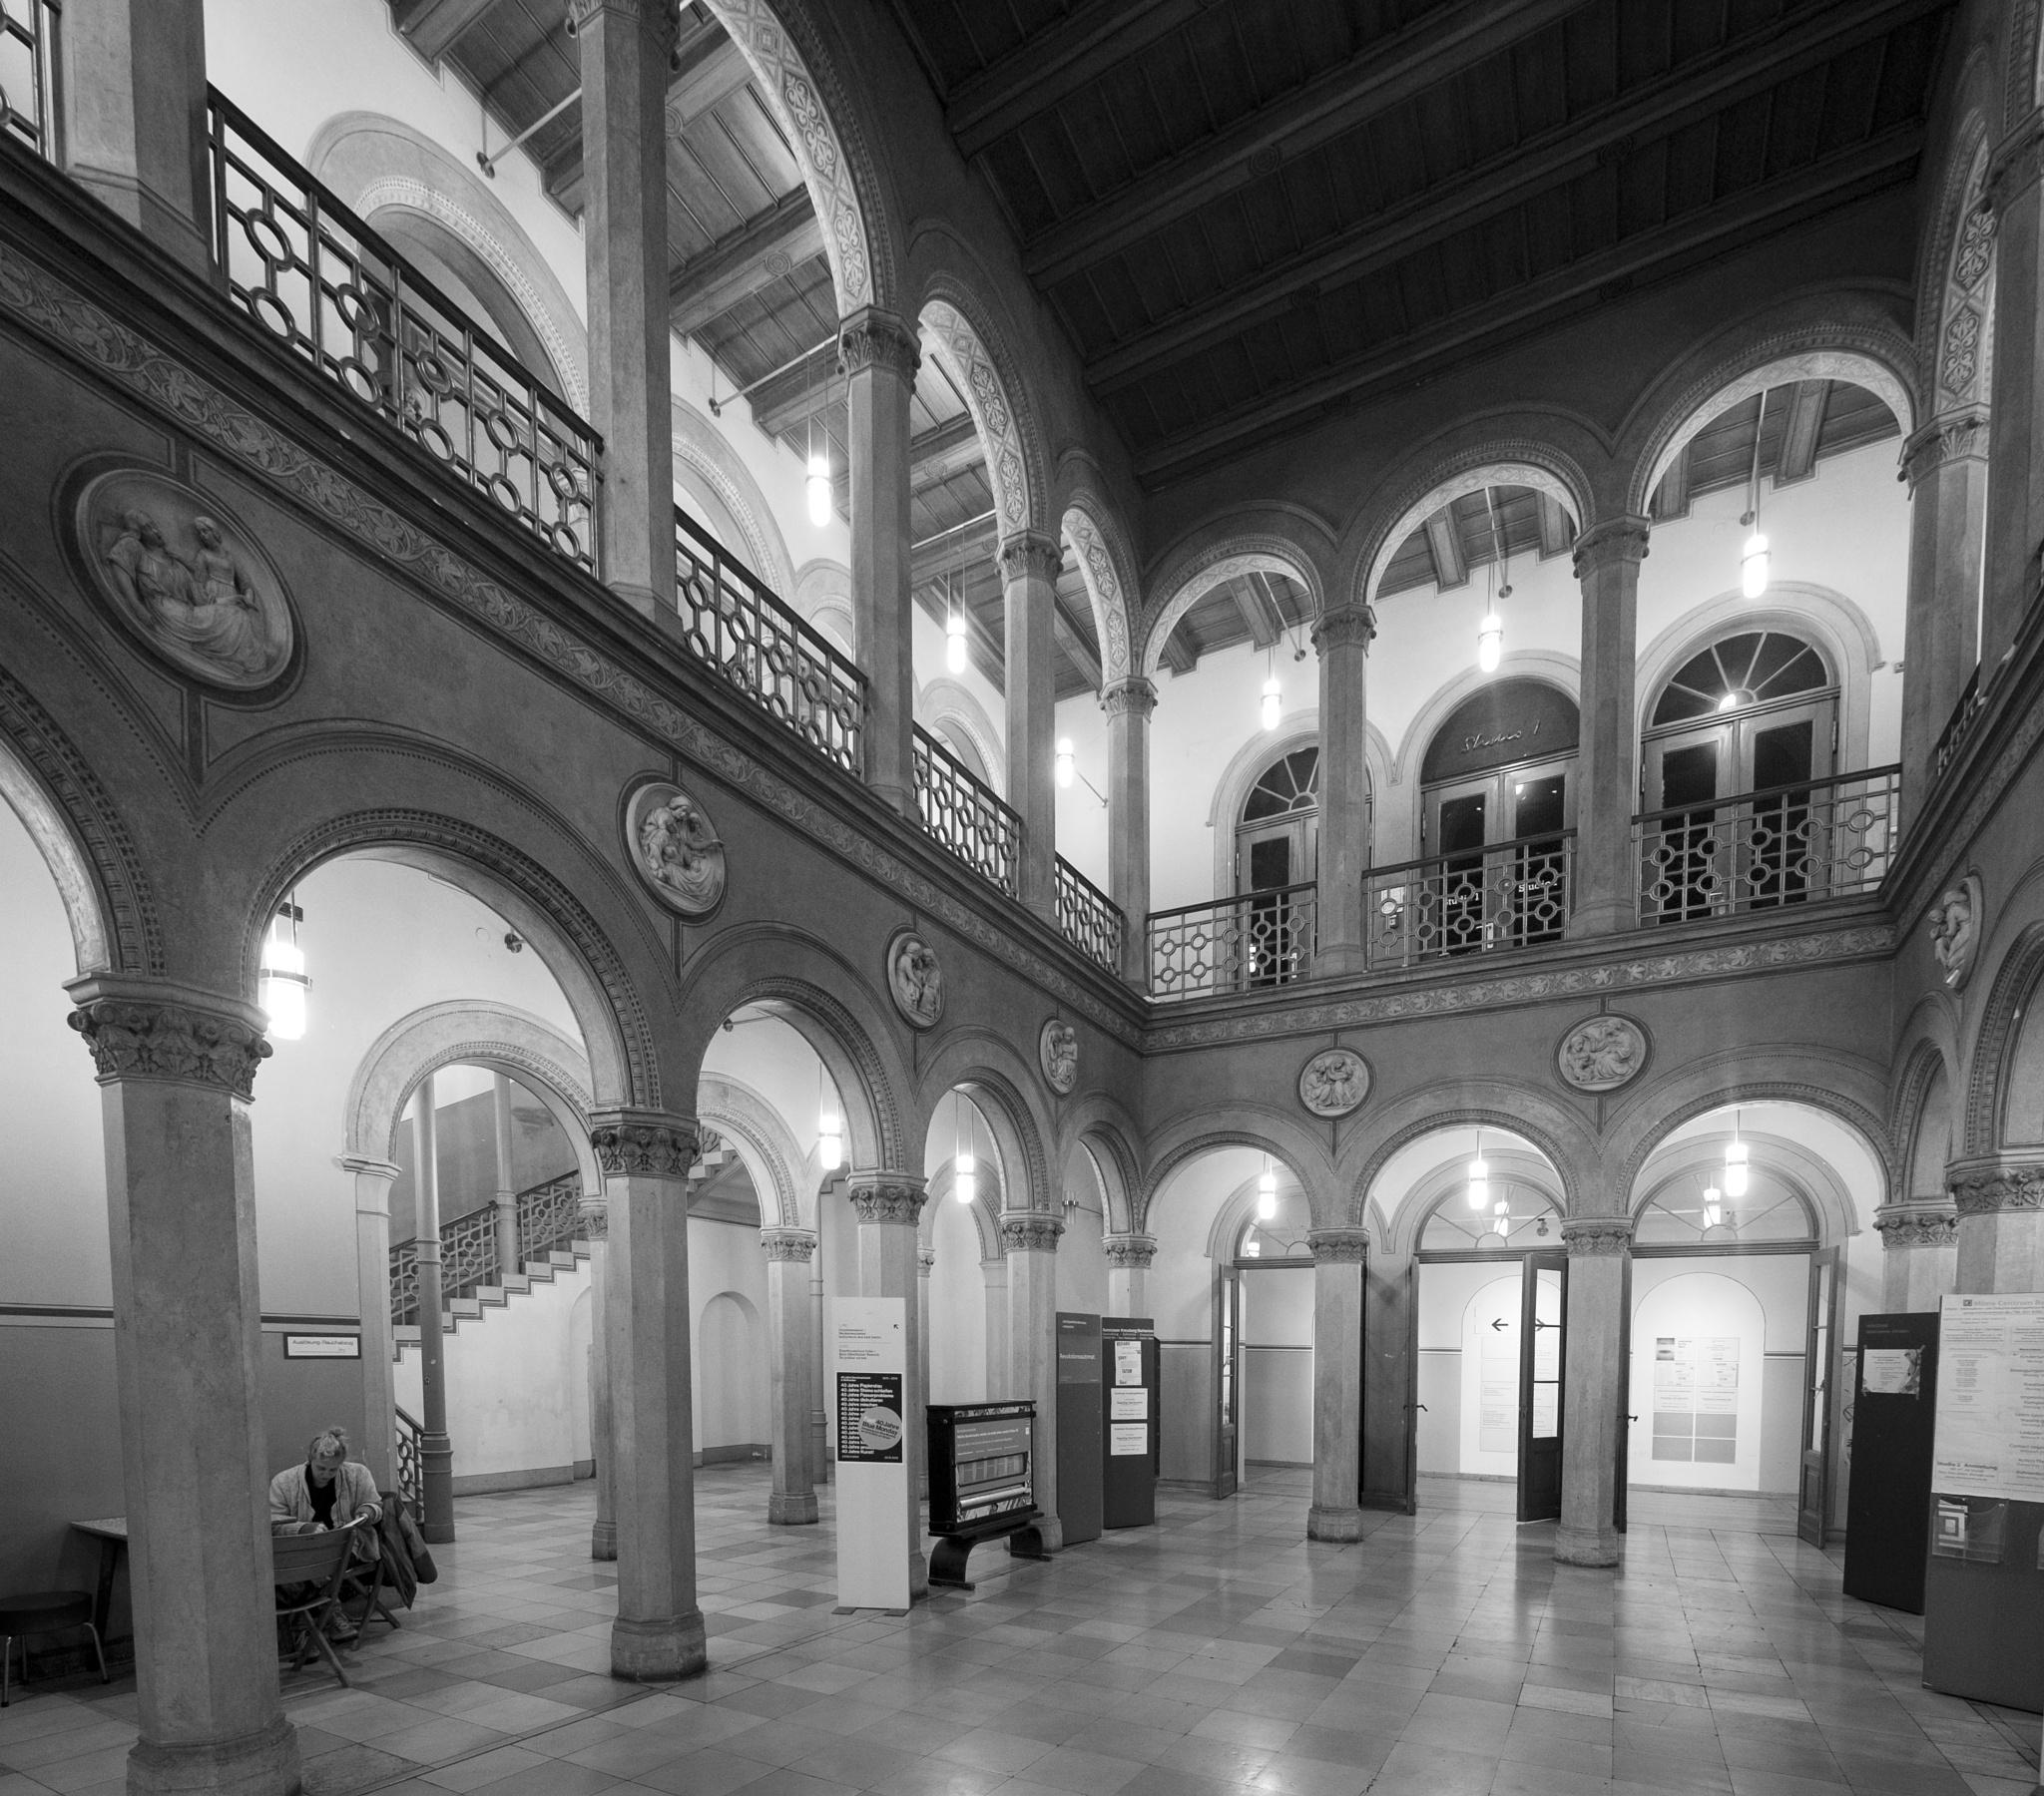 Bethanien entrance hall by Ulrich Gerndt